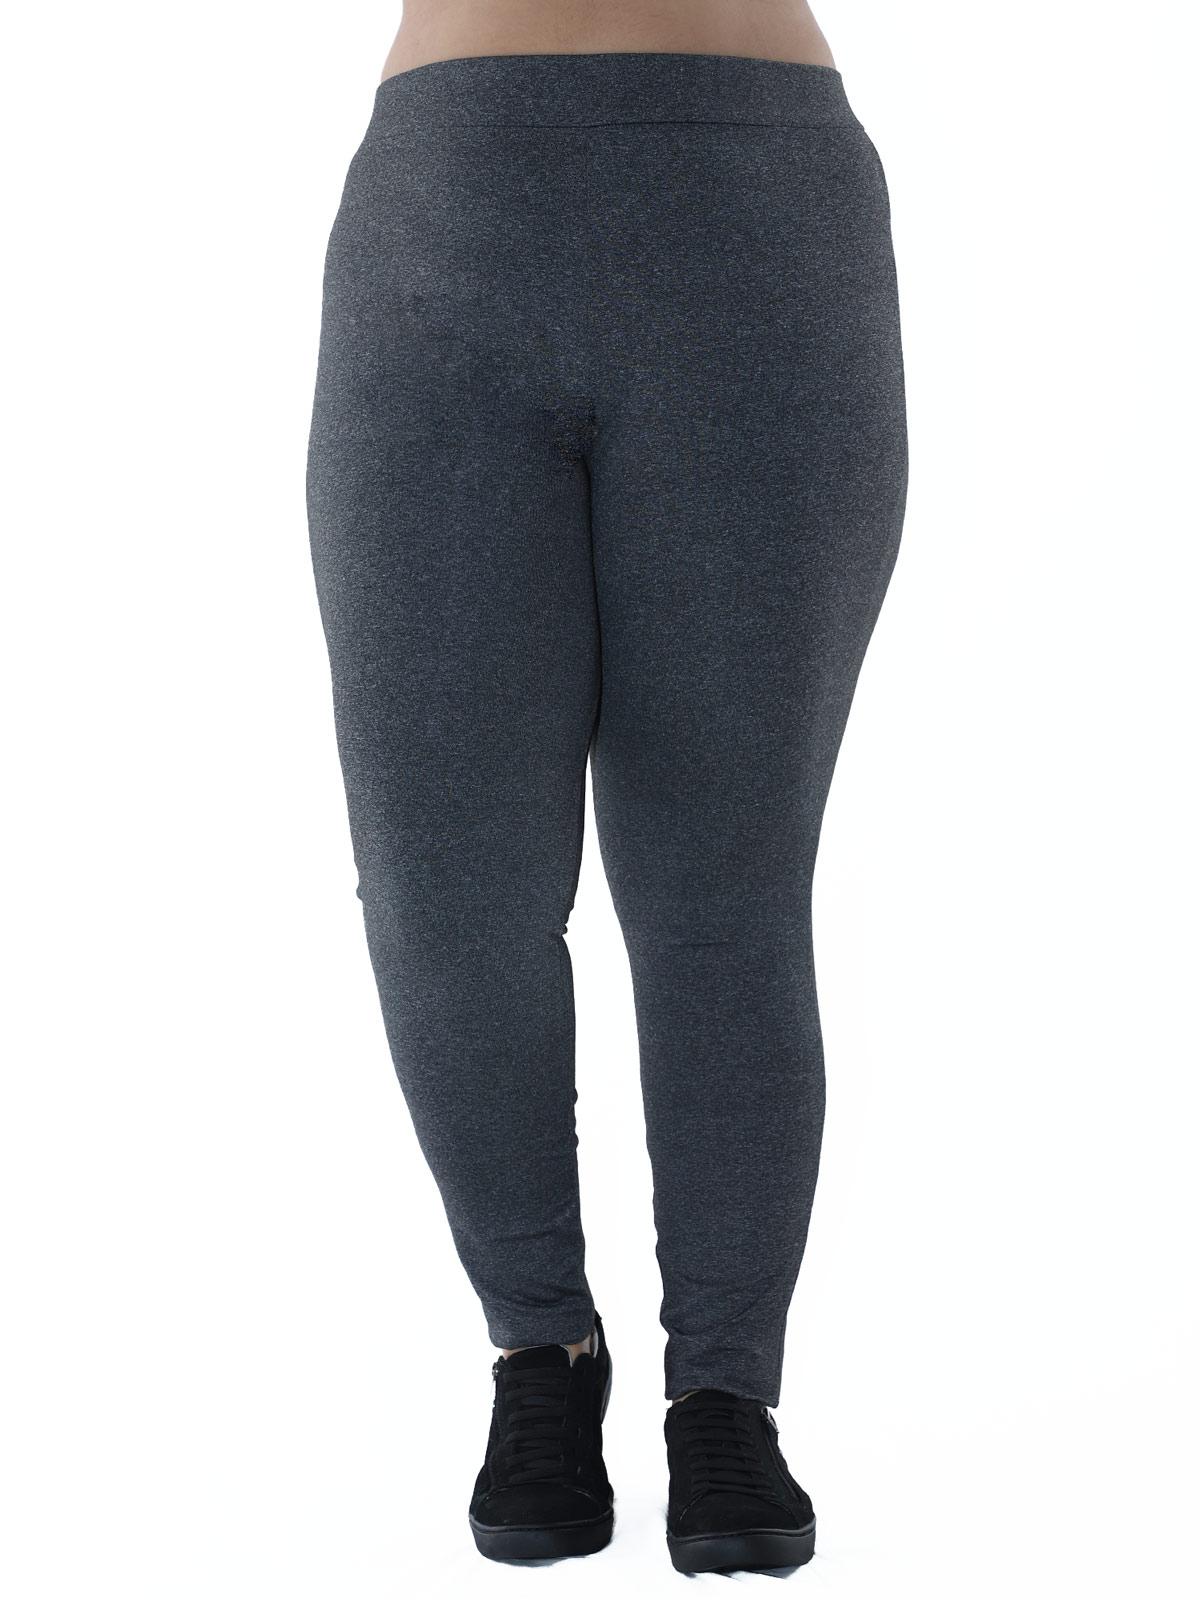 Kit 3 Calças Legging Plus Size 2 PRETA, MESCLA